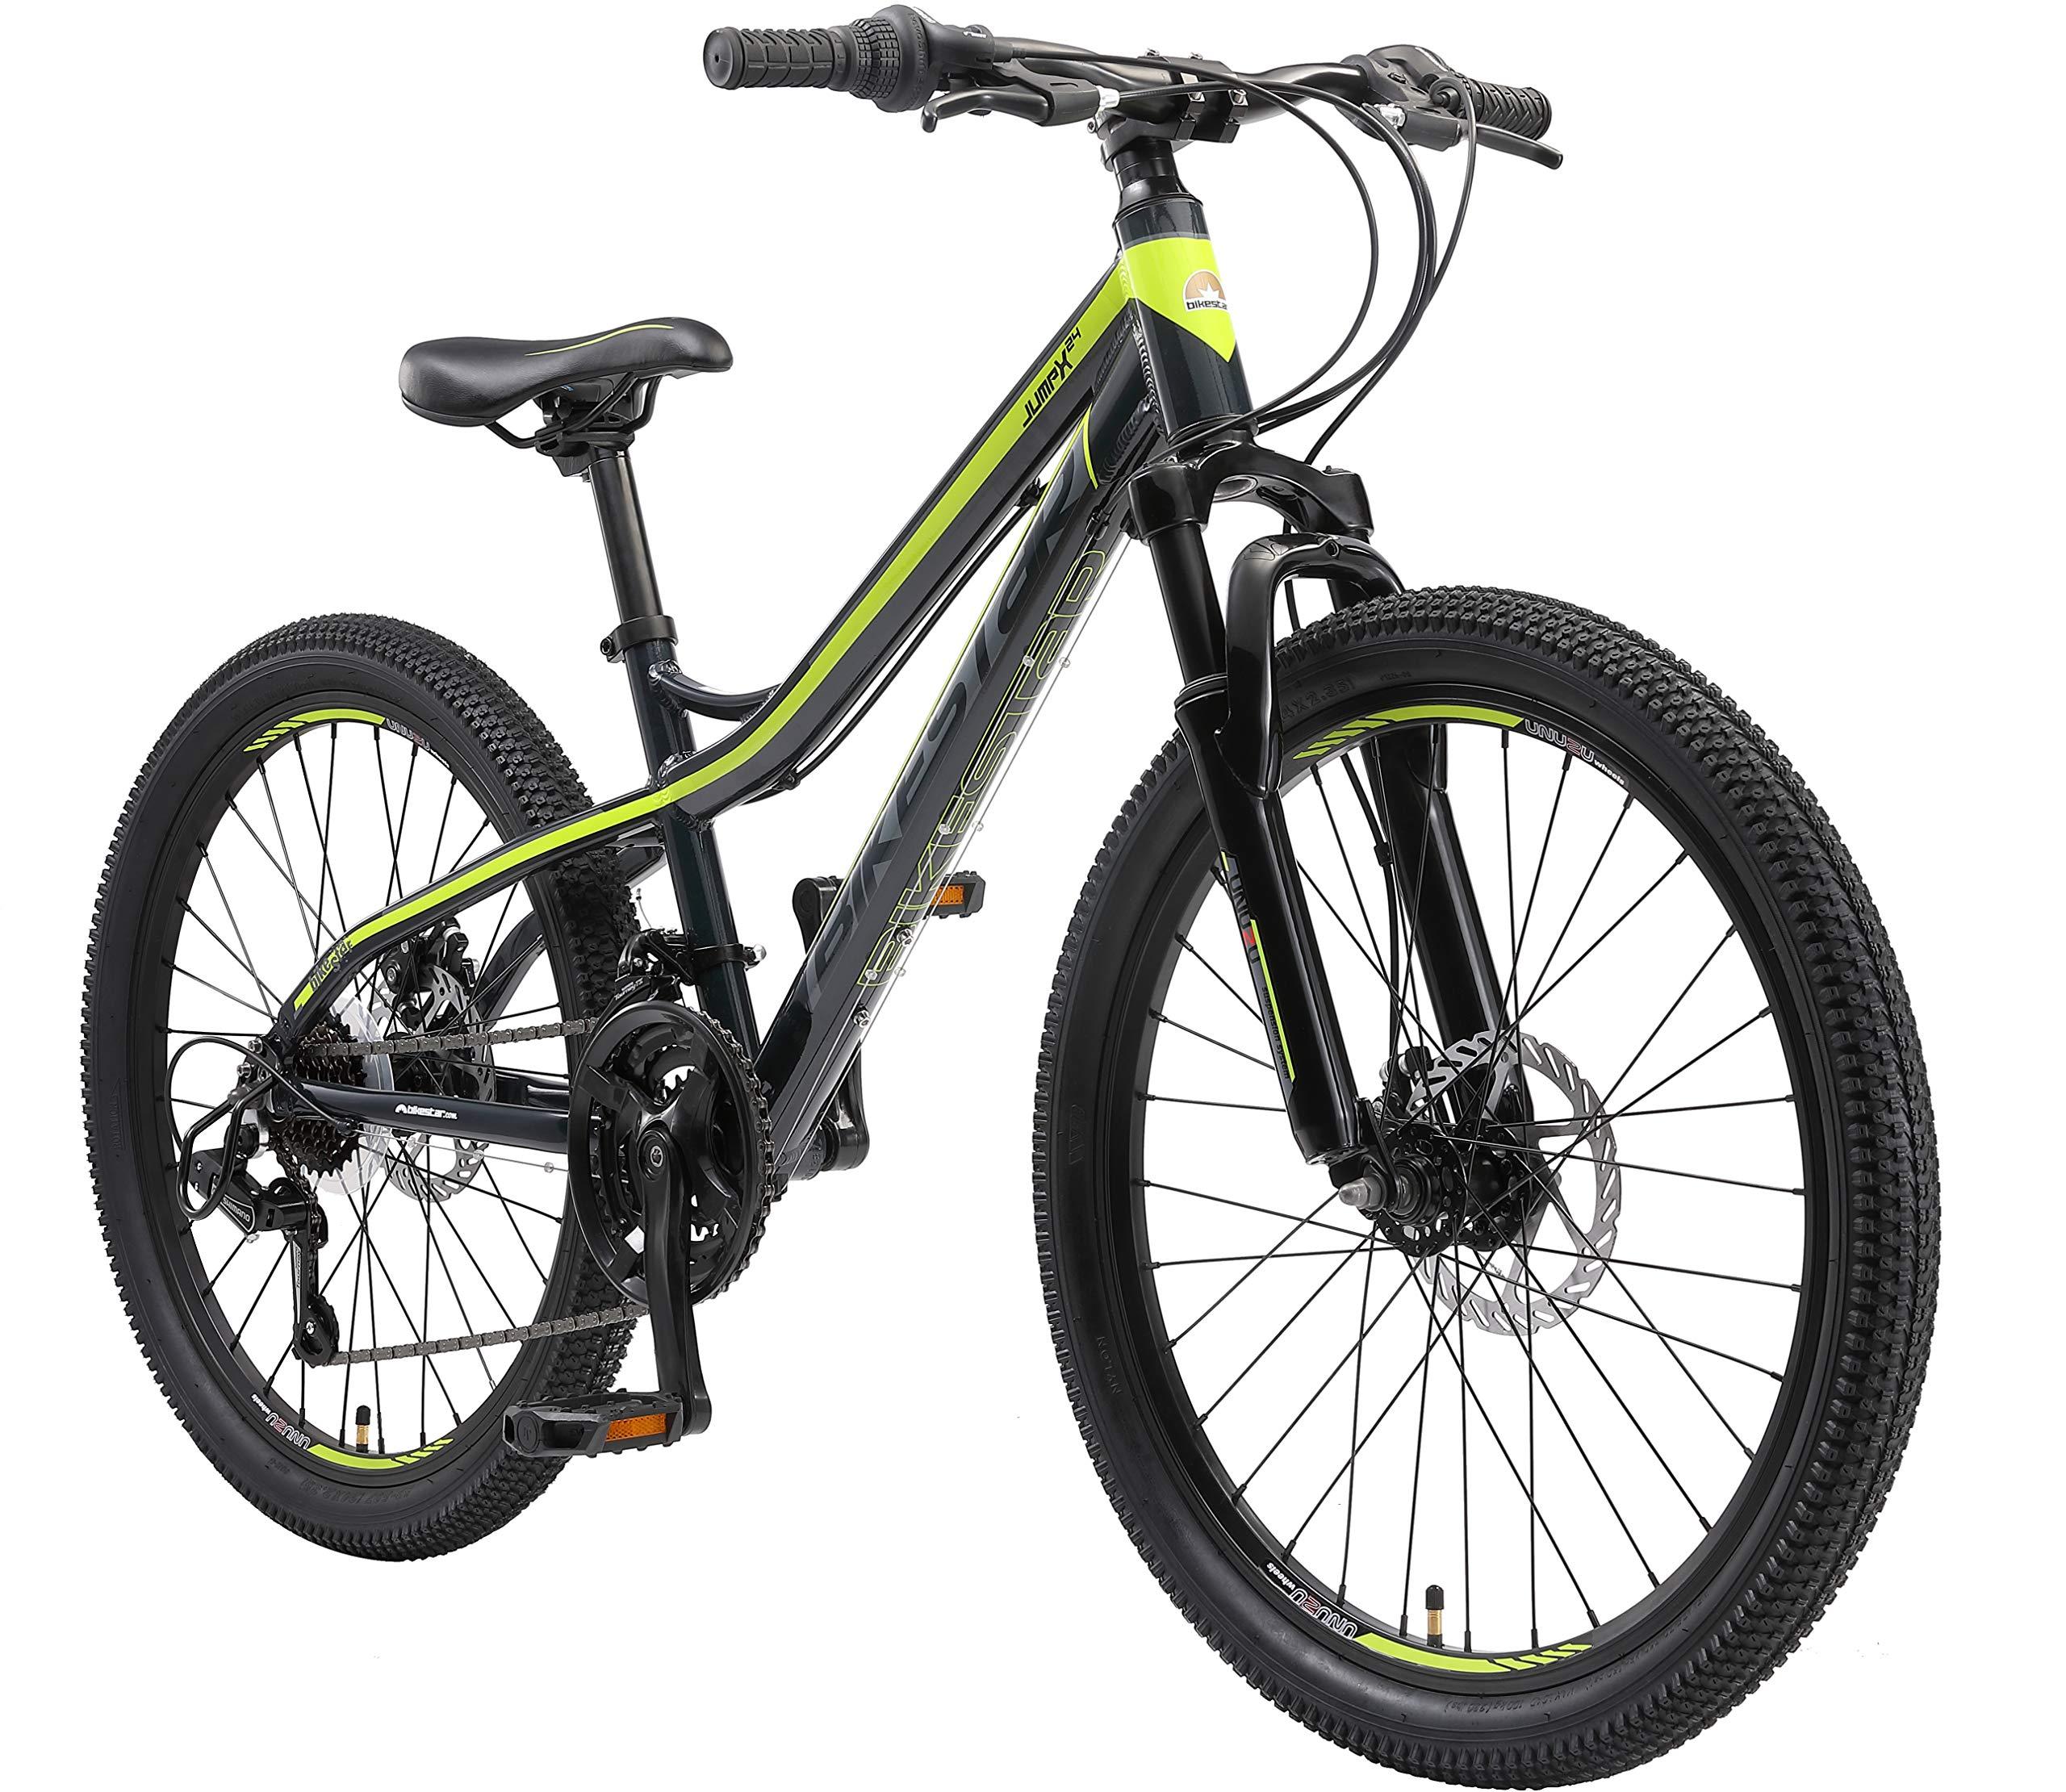 BIKESTAR Kids Mountain bike aluminium 24 Inch 10-13 years | Children youth bicycle 21 gear Shimano, Disc Brake, Suspension Fork, Hardtail